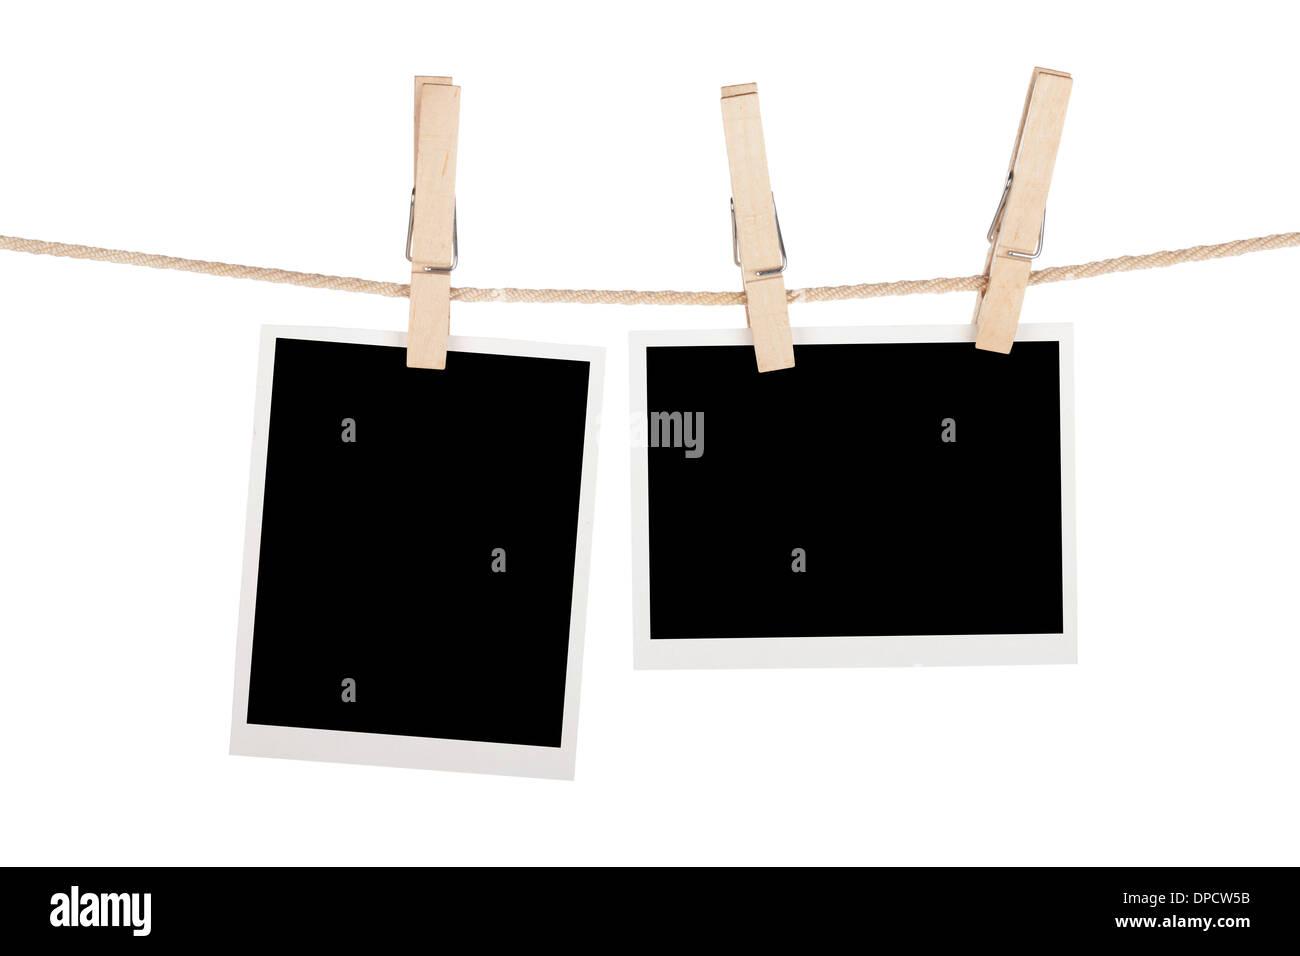 Blank photos hanging on clothesline. Isolated on white background - Stock Image